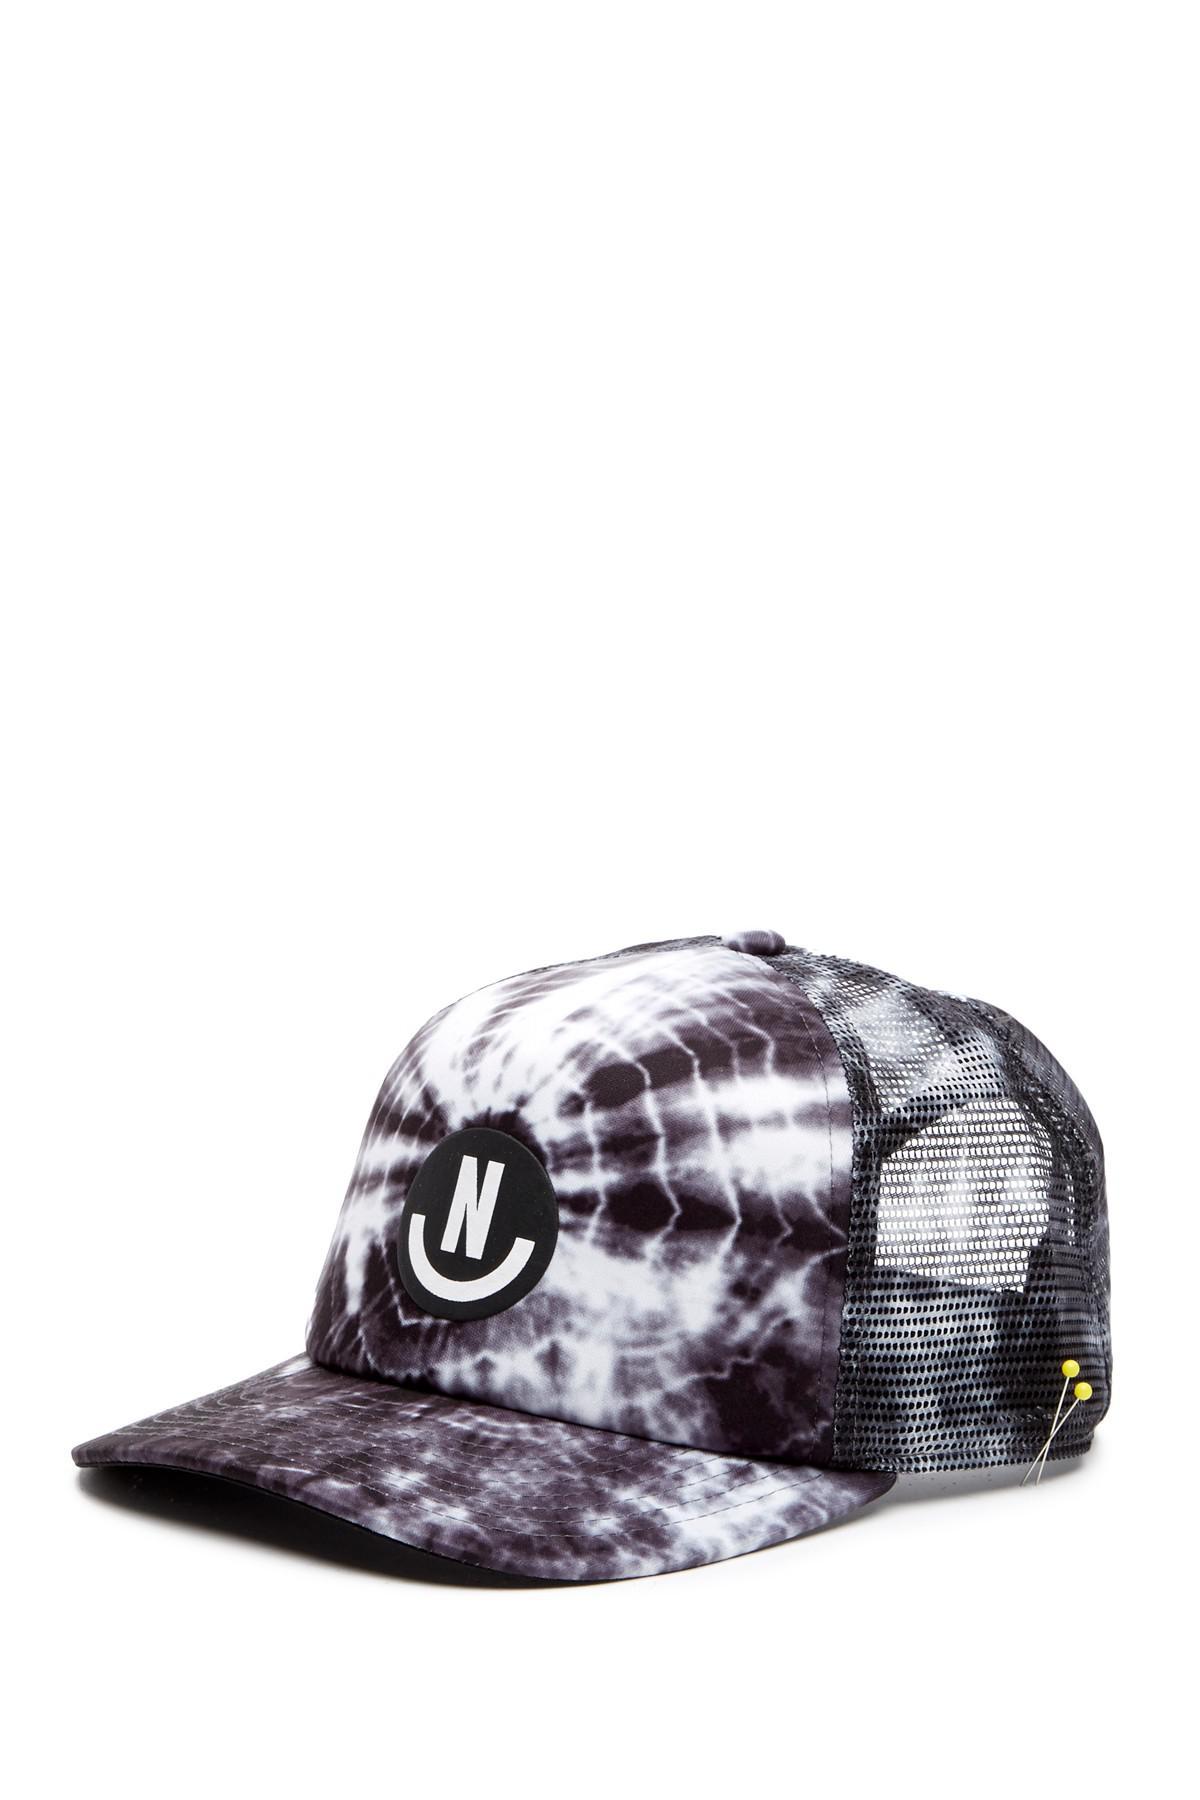 ea175ebb Lyst - Neff Smile Wash Trucker Hat in Black for Men